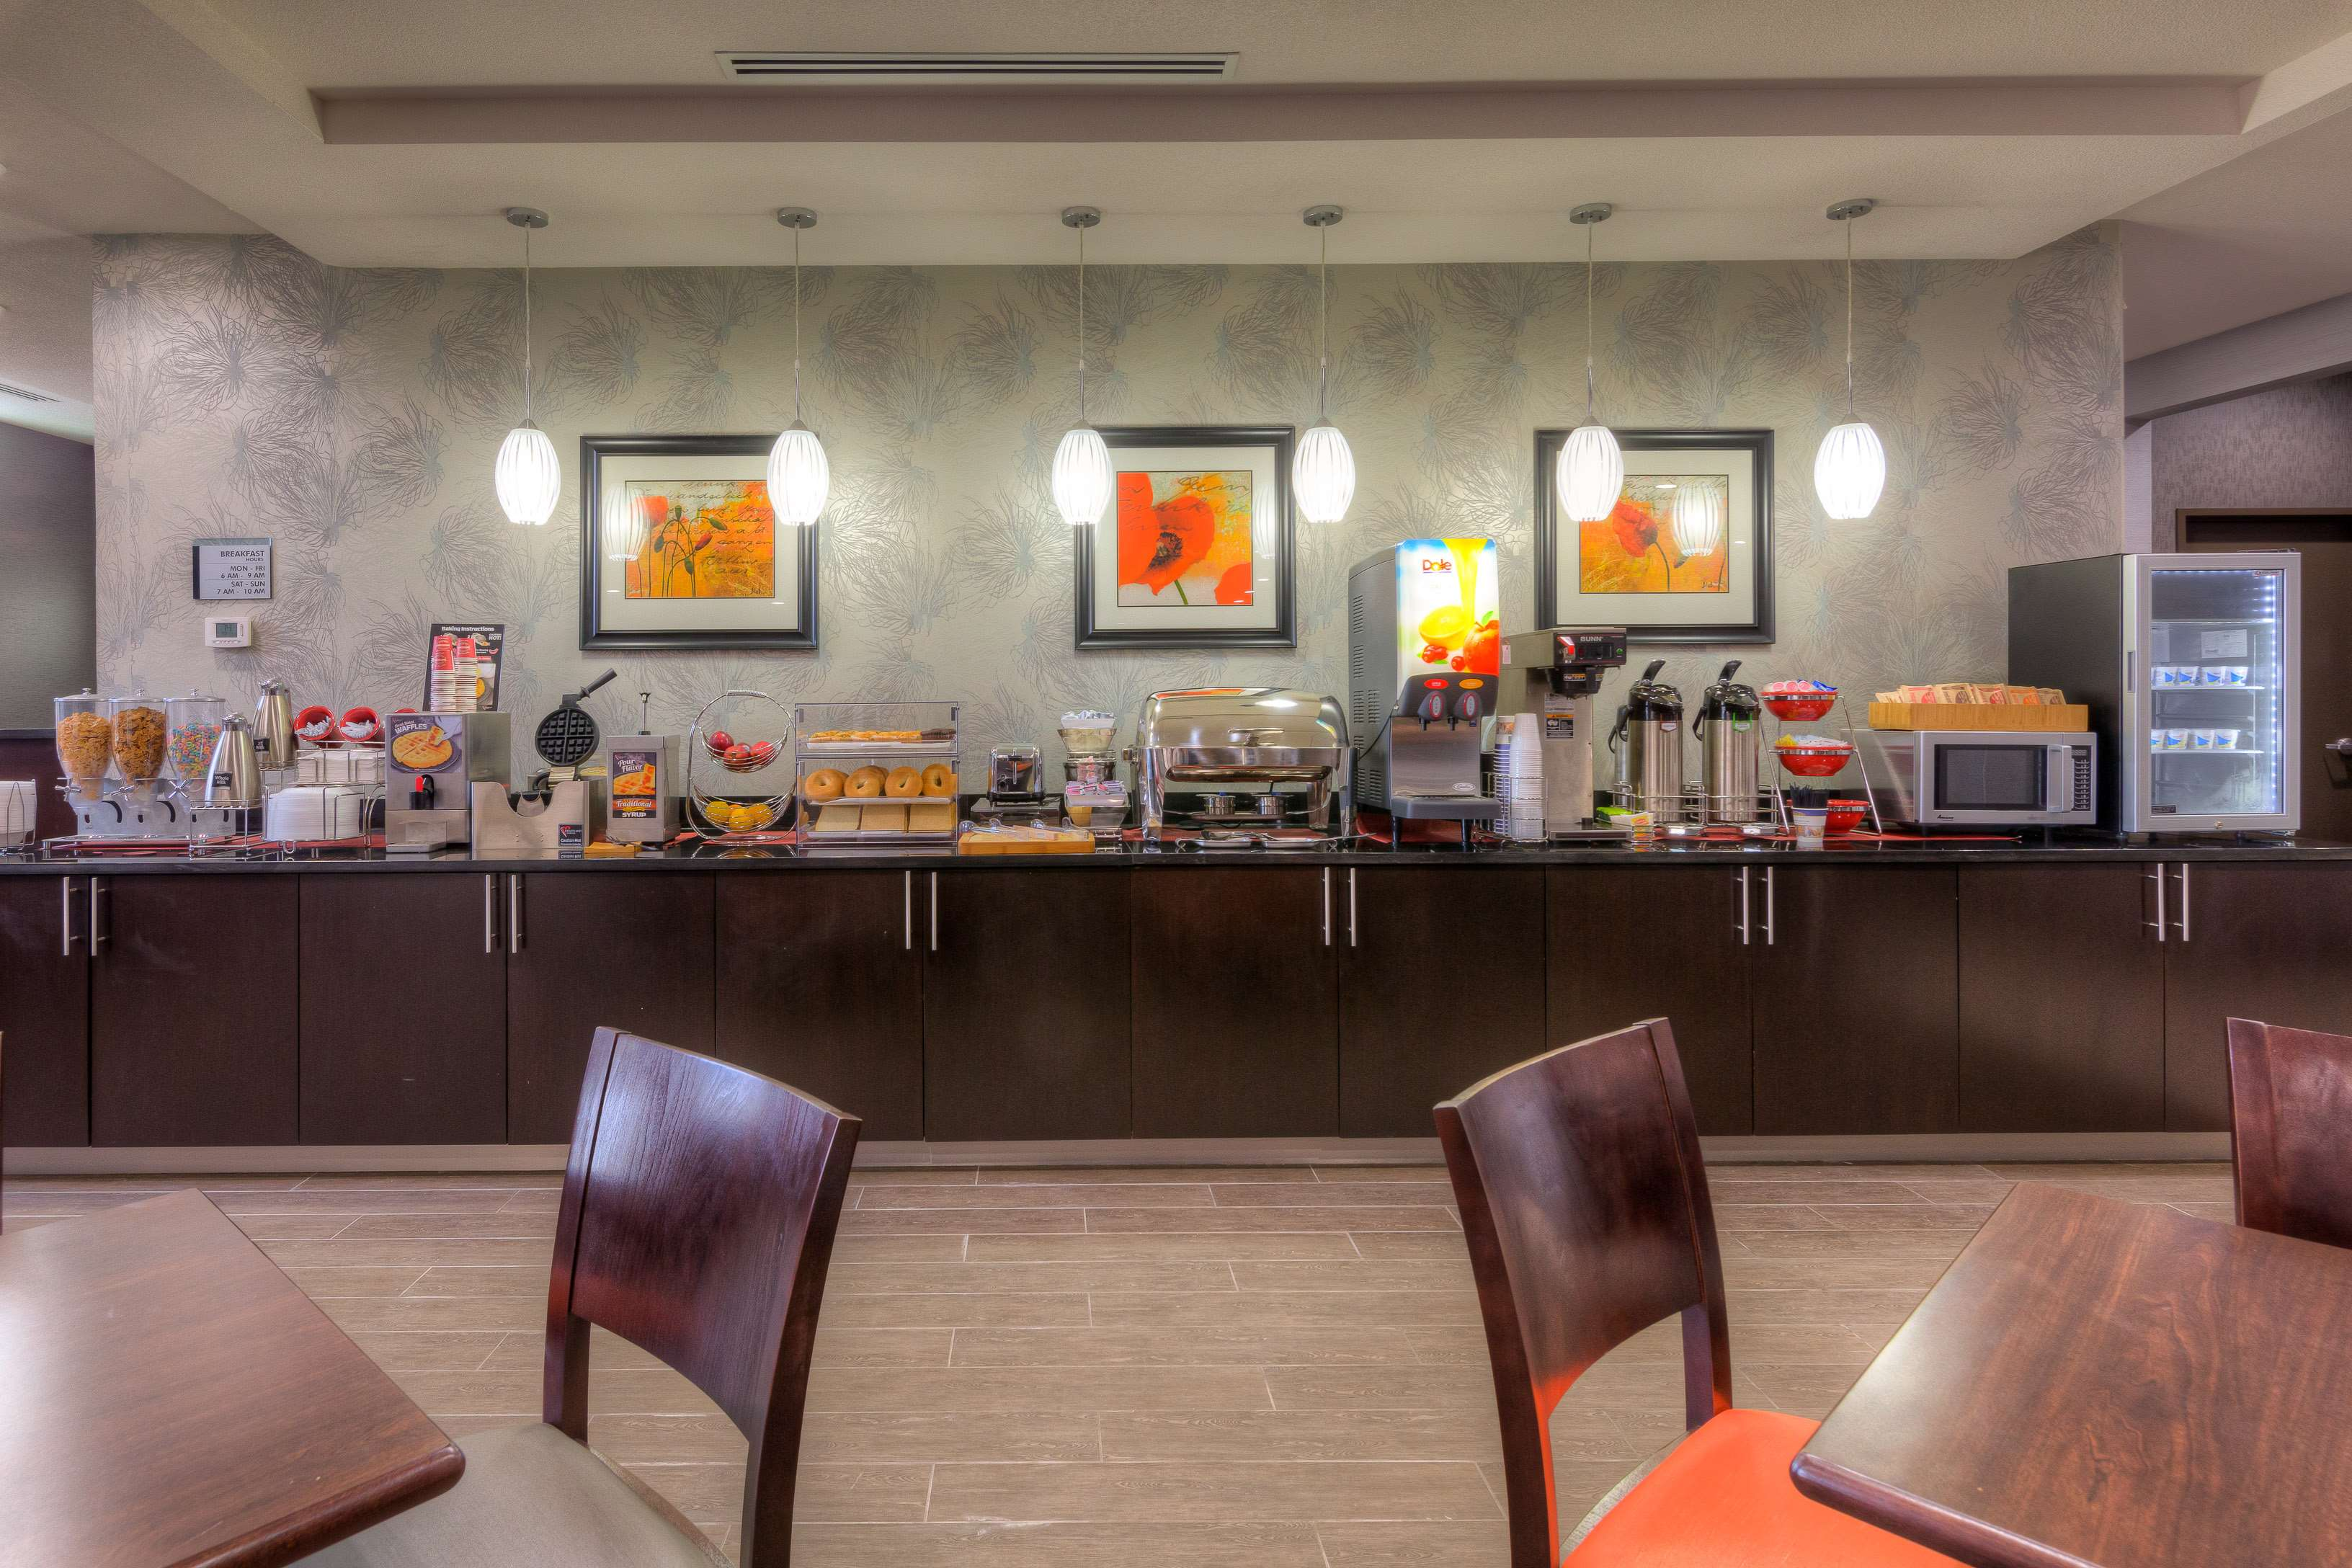 Best Western Plus Coweta S 1st Hotel 13593 State Highway 51 Ok 74429 Yp